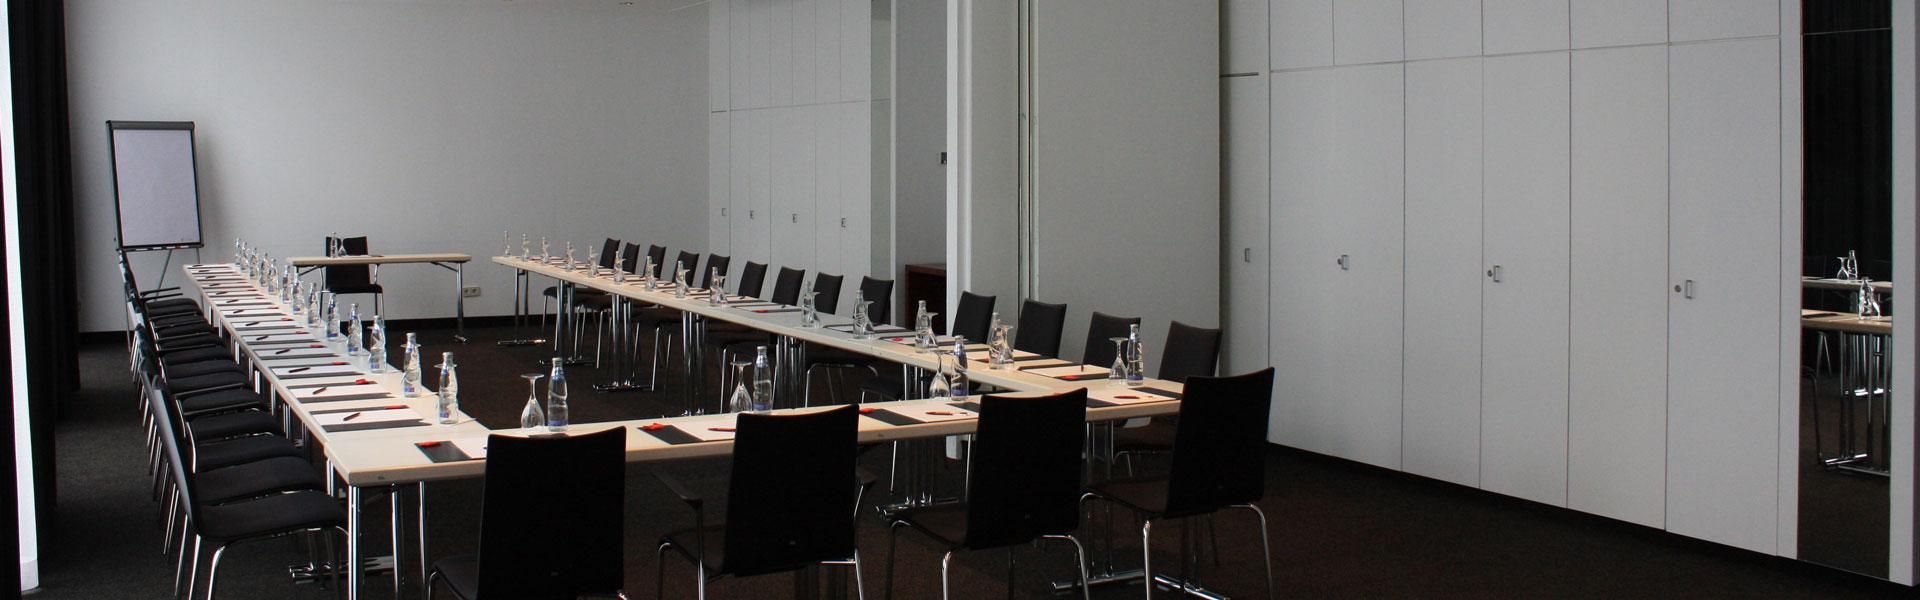 Tagungsraum Ravensberg Tagung Bielefeld